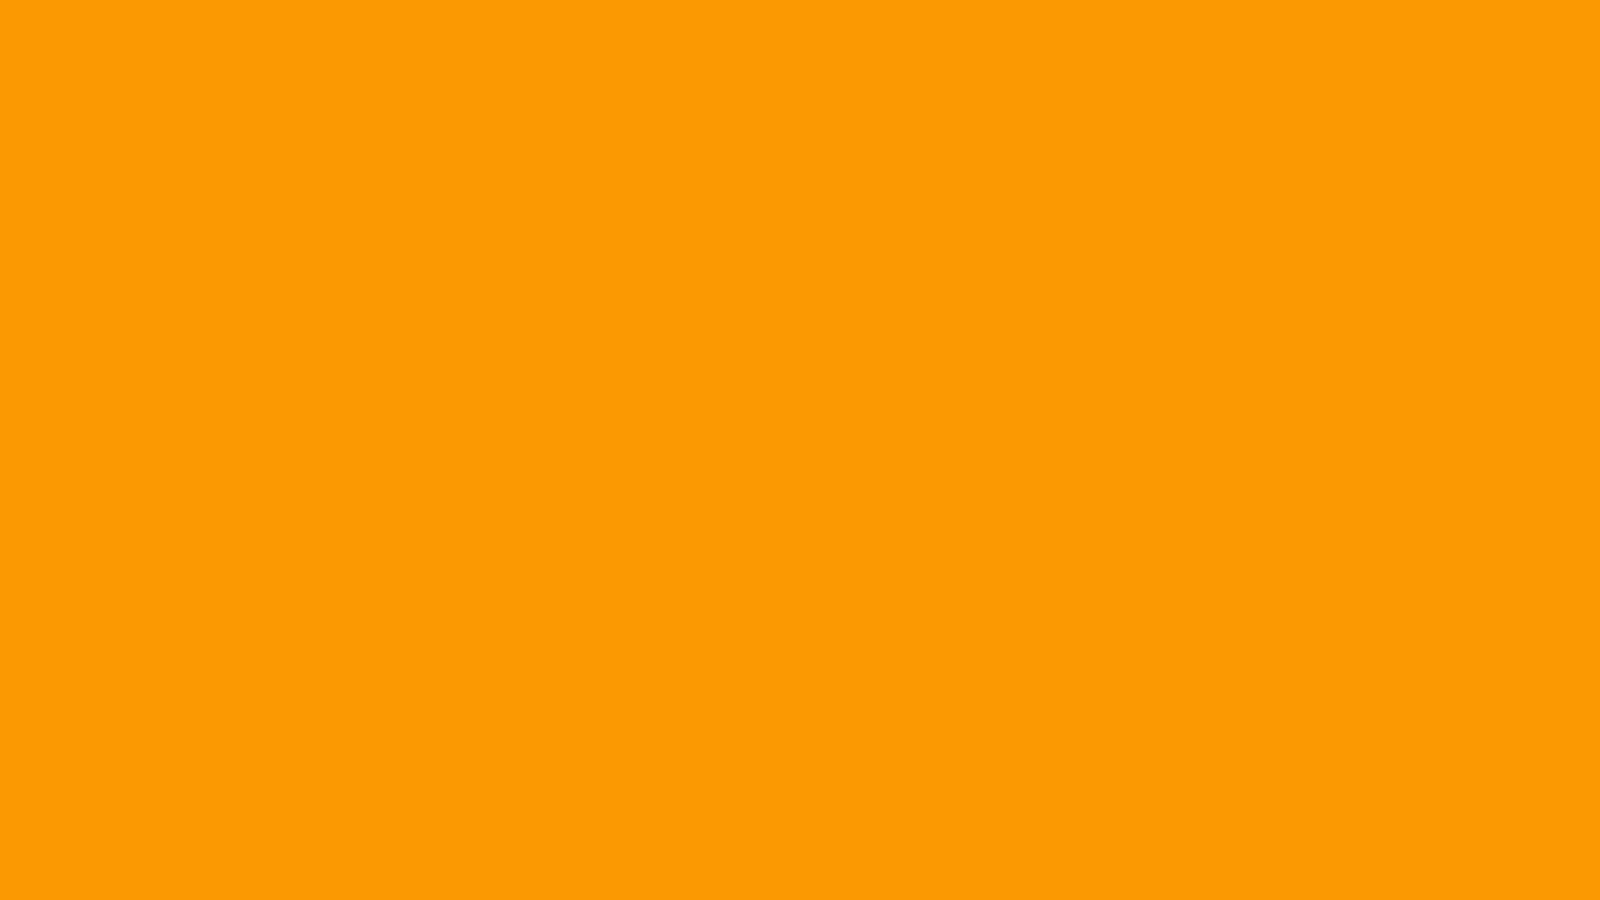 1600x900 Orange RYB Solid Color Background